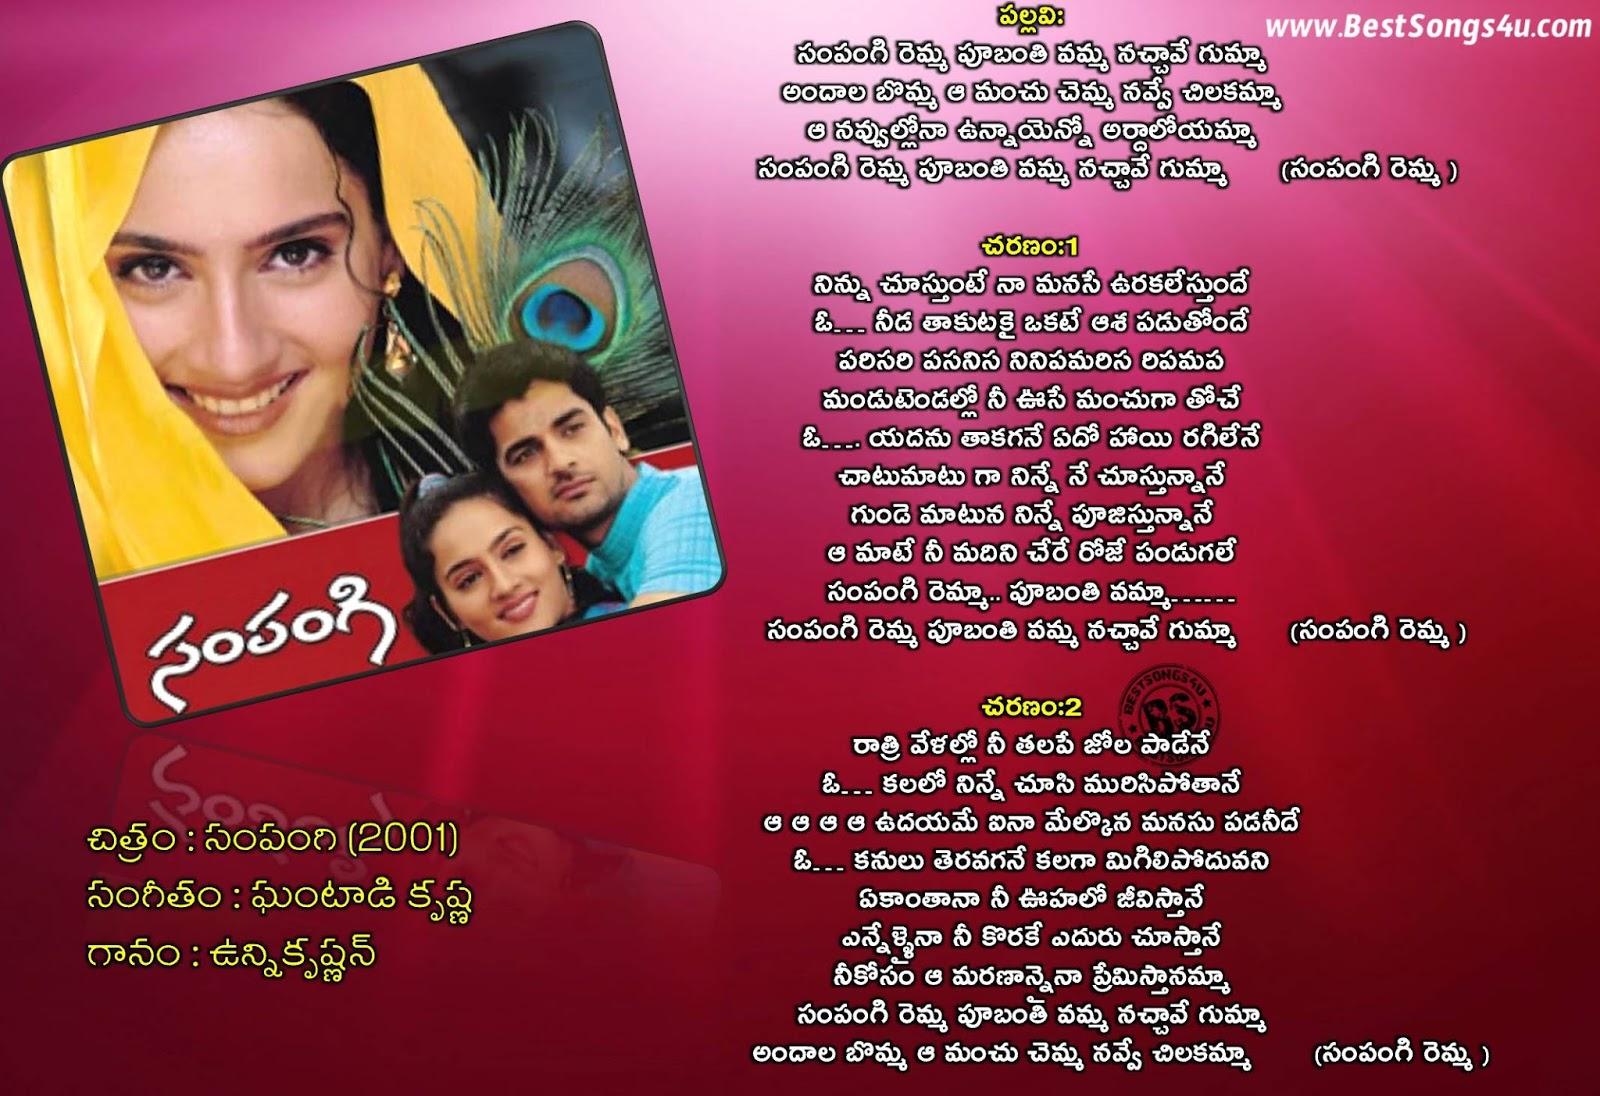 sampangi telugu movie mp3 songs